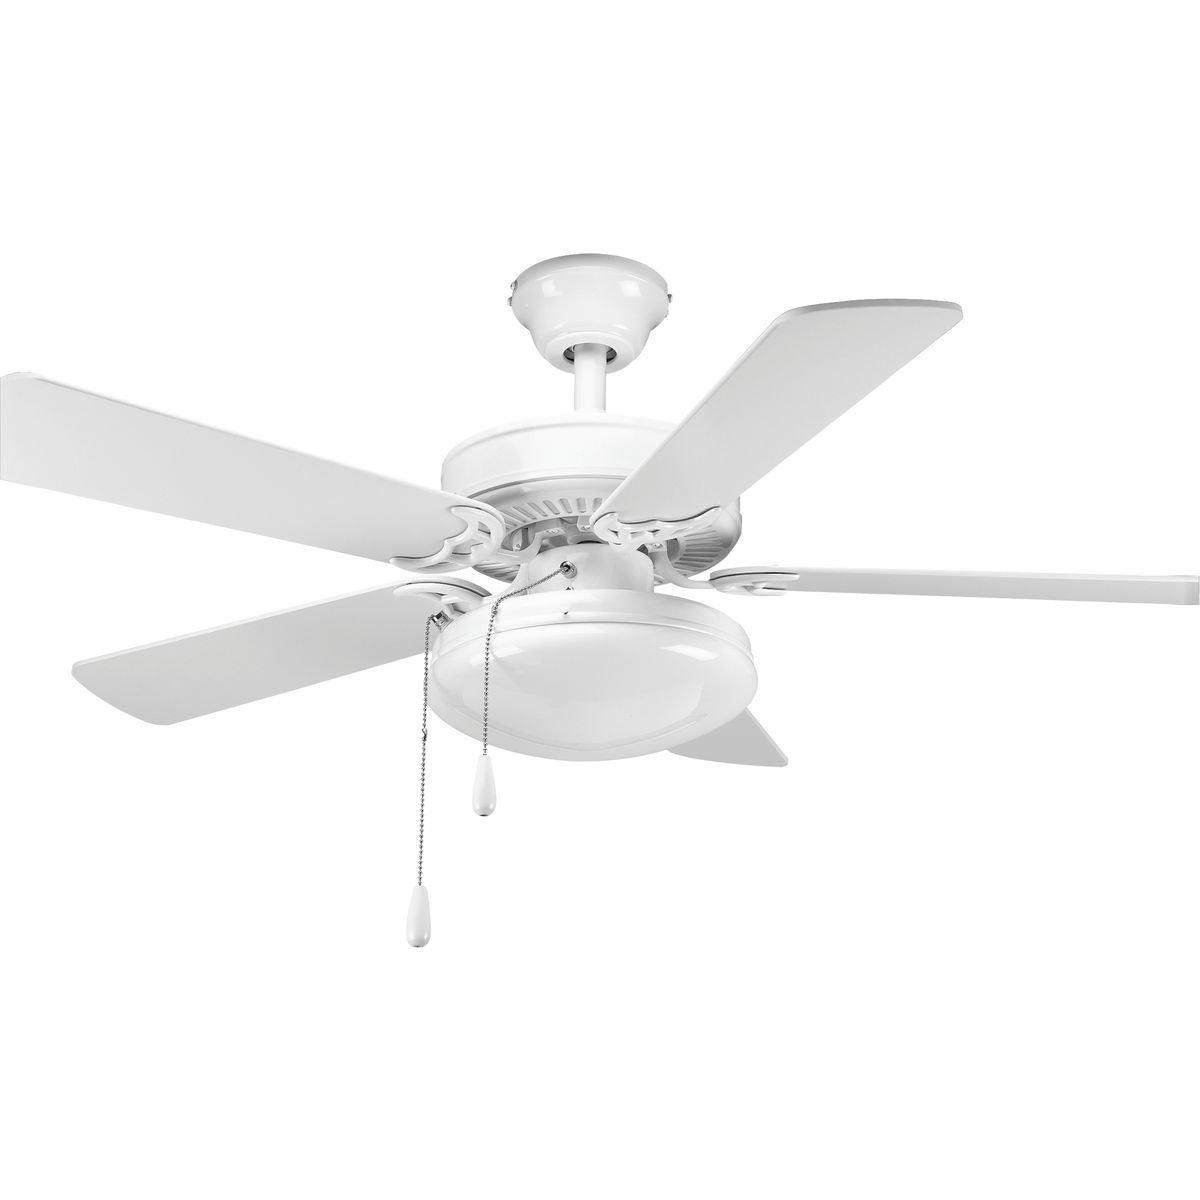 "Cerro 5 Blade Ceiling Fans Inside Most Recent 42"" Goreville 5 Blade Ceiling Fan (View 7 of 20)"